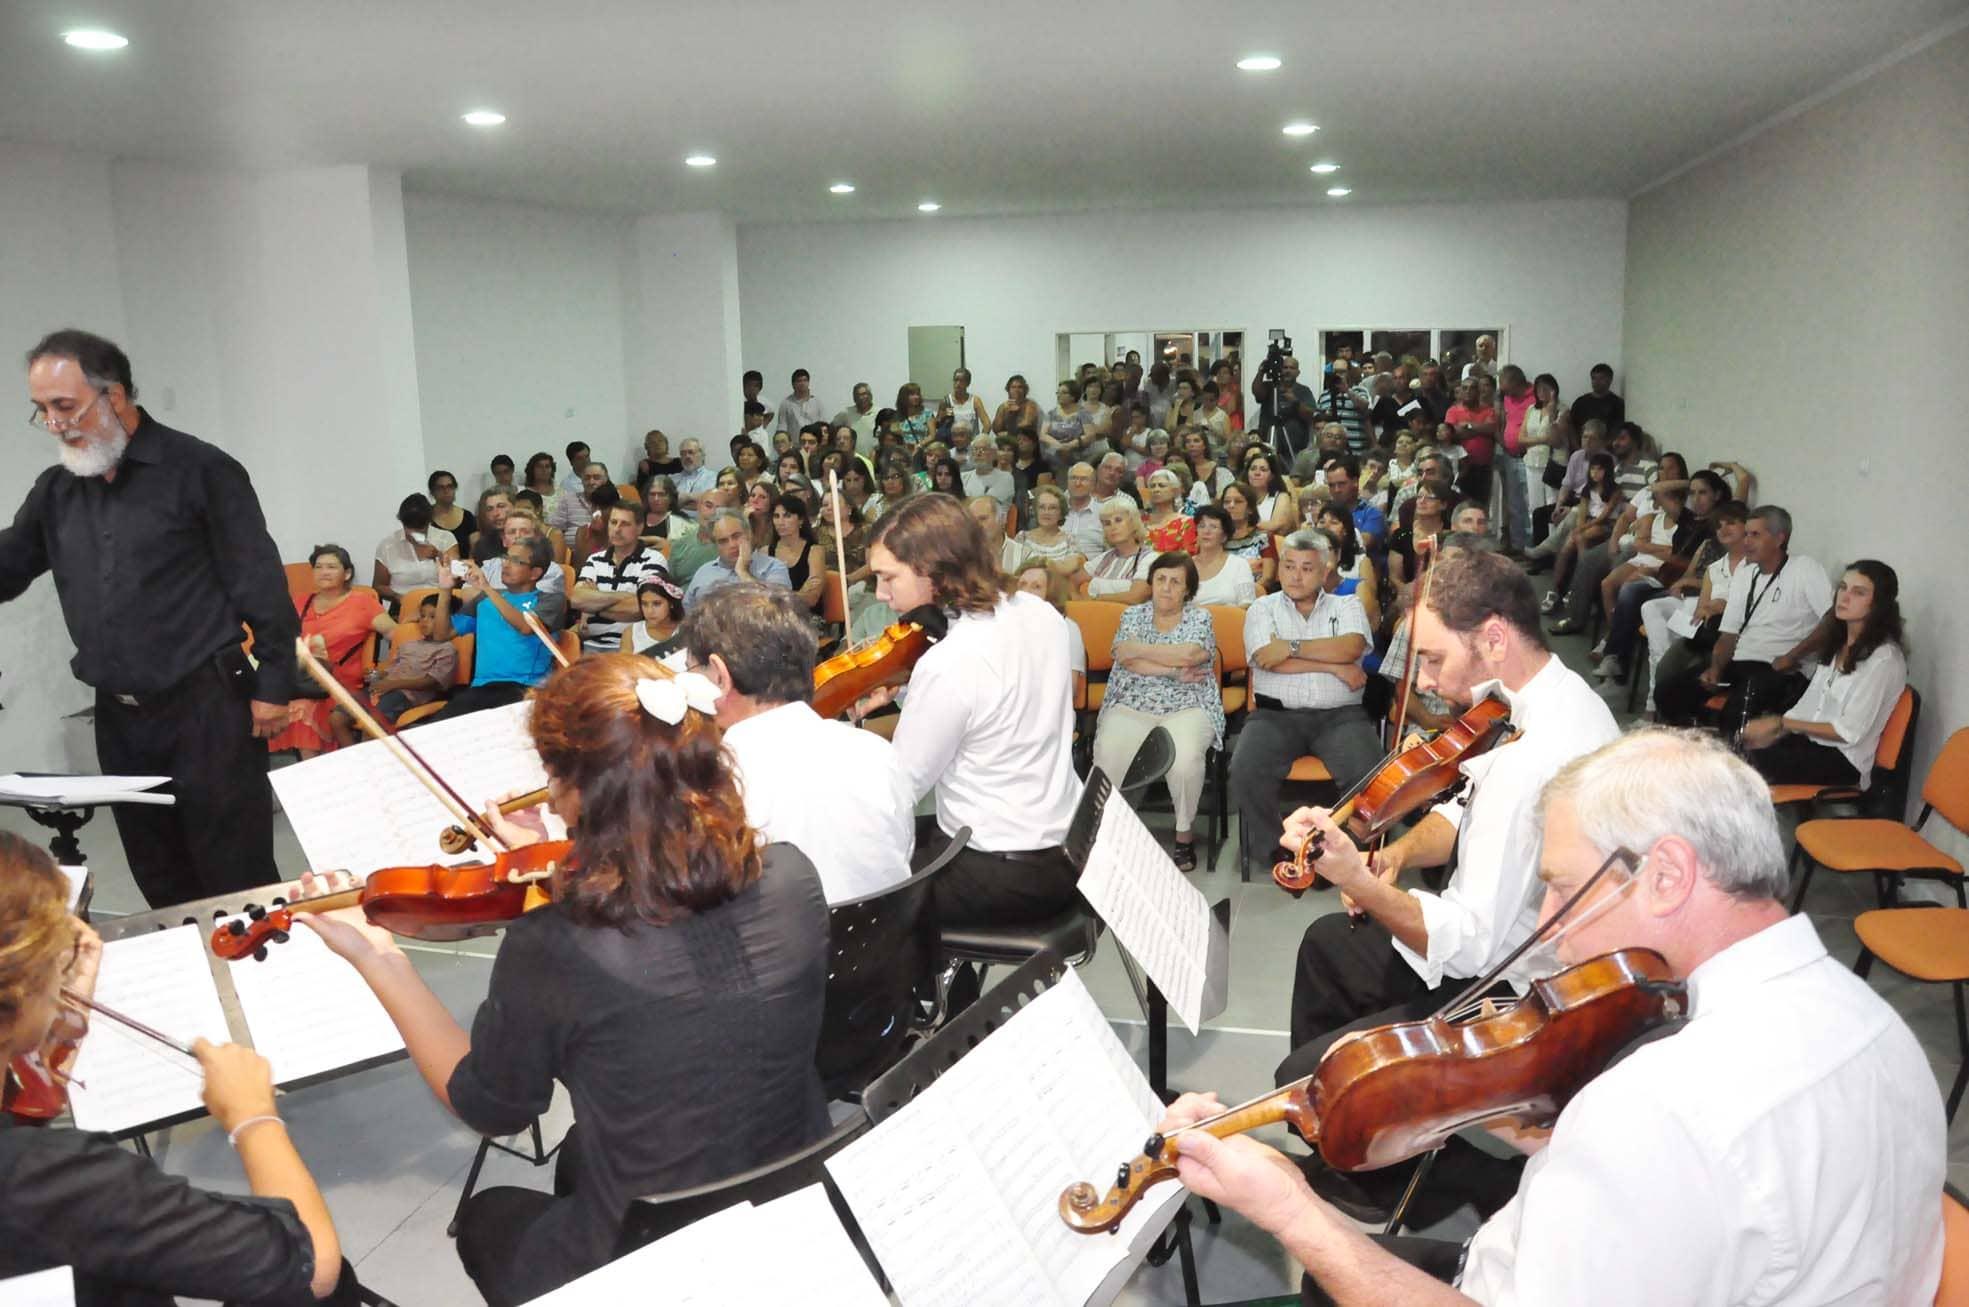 Homenaje a Barracchia escuela de música - enero 2016 (18)